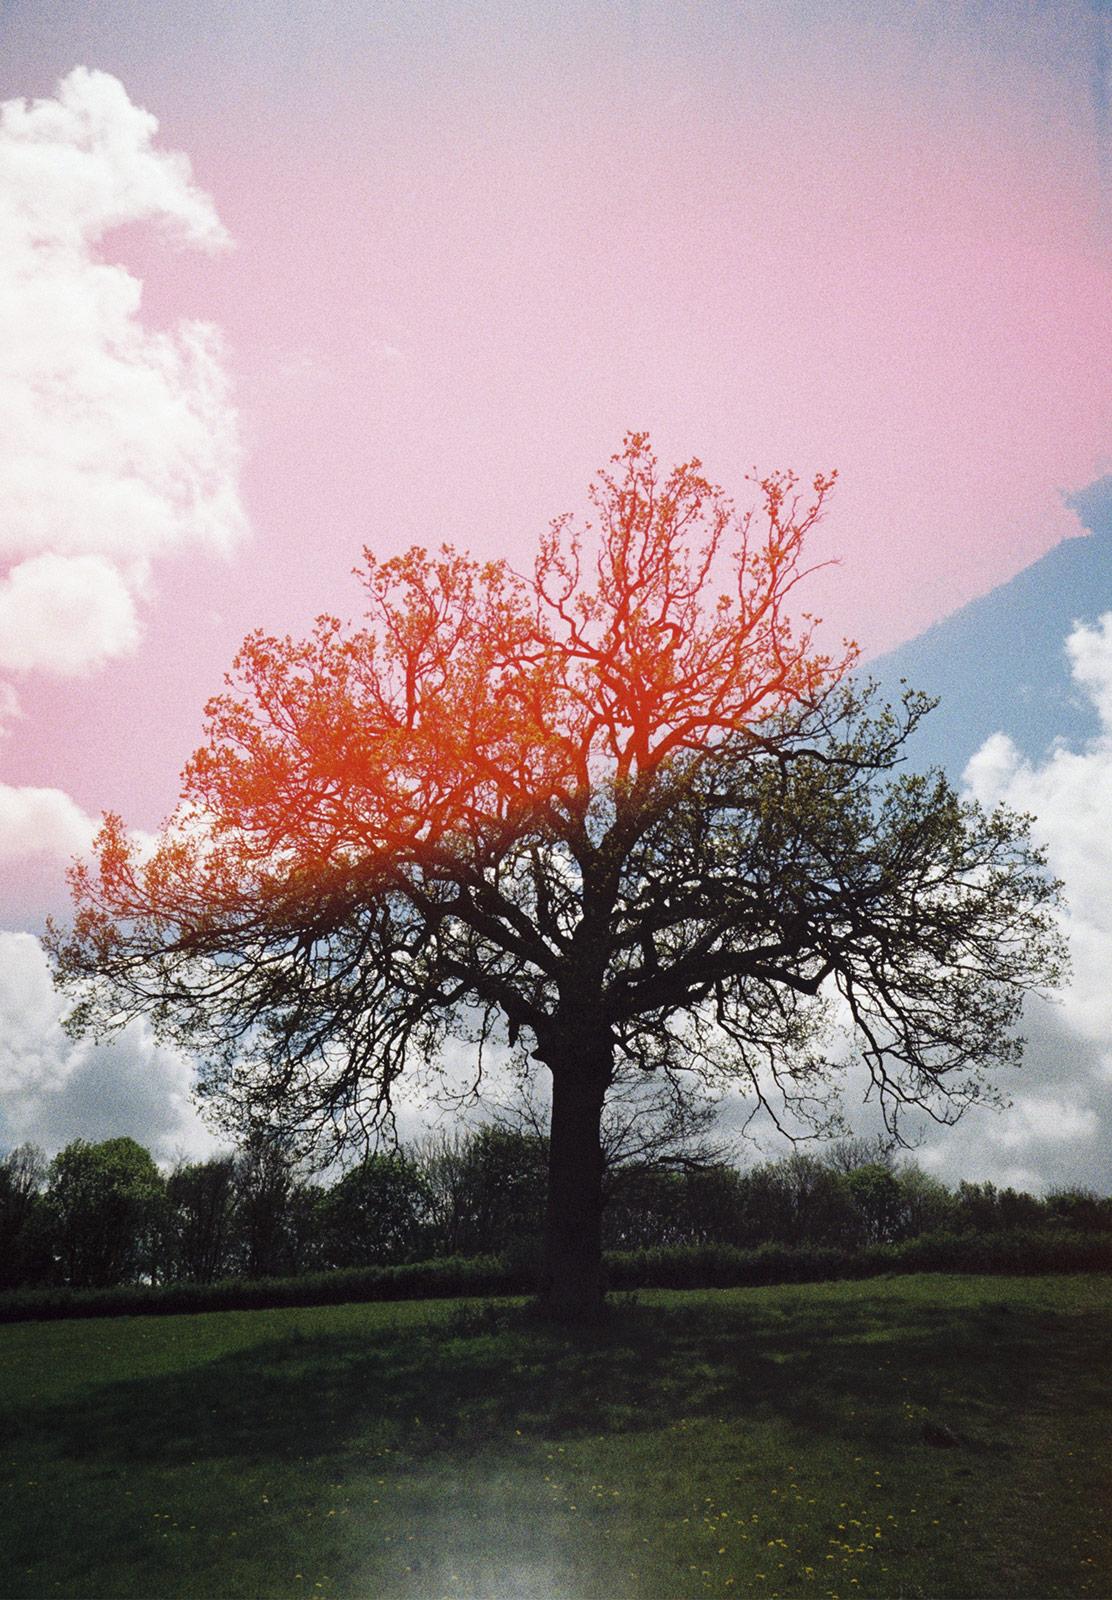 Leafless tree on hill